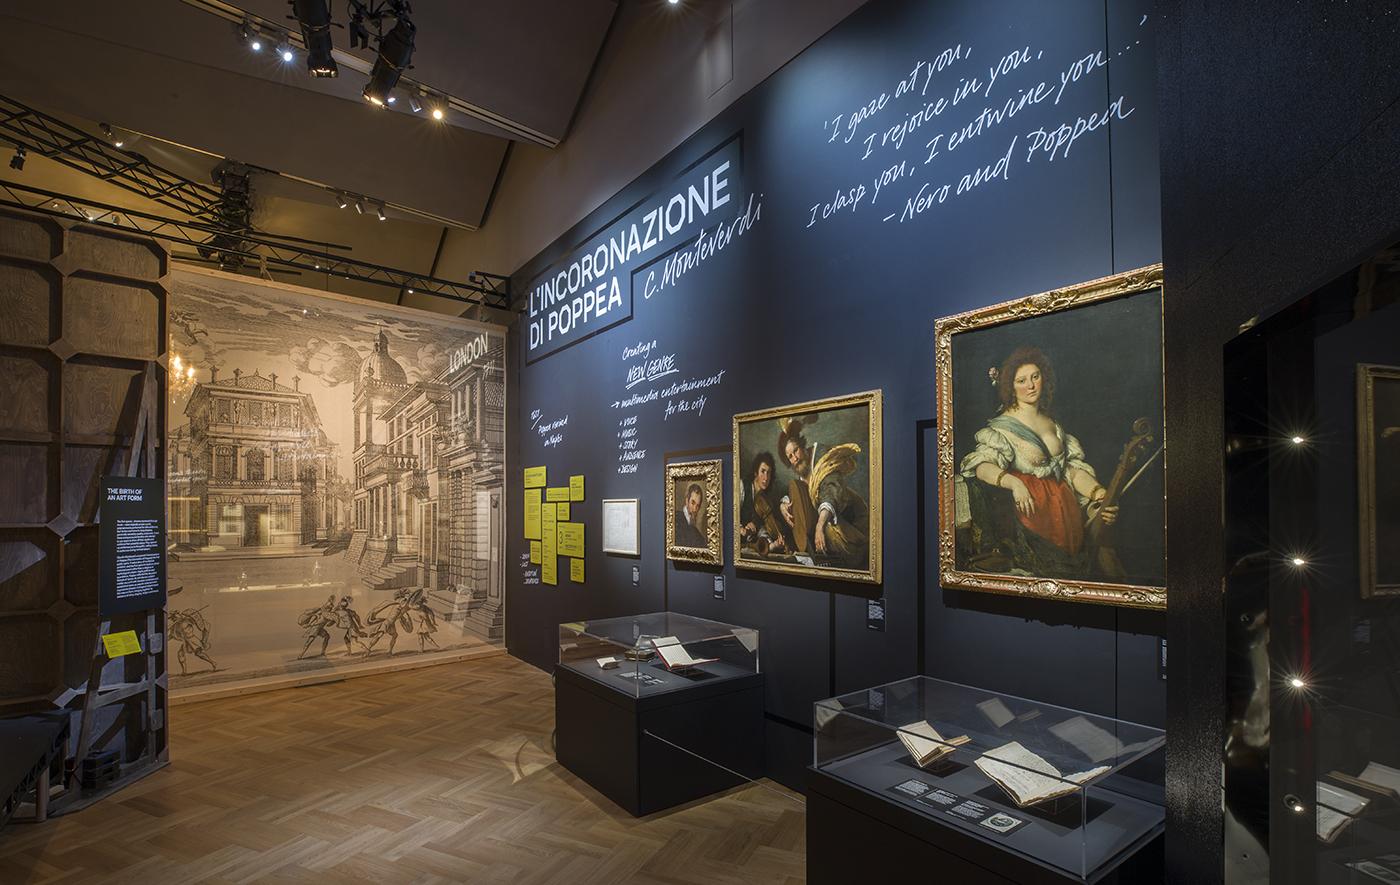 Opera: Passion, Power and Politics installation image | © Victoria and Albert Museum, London